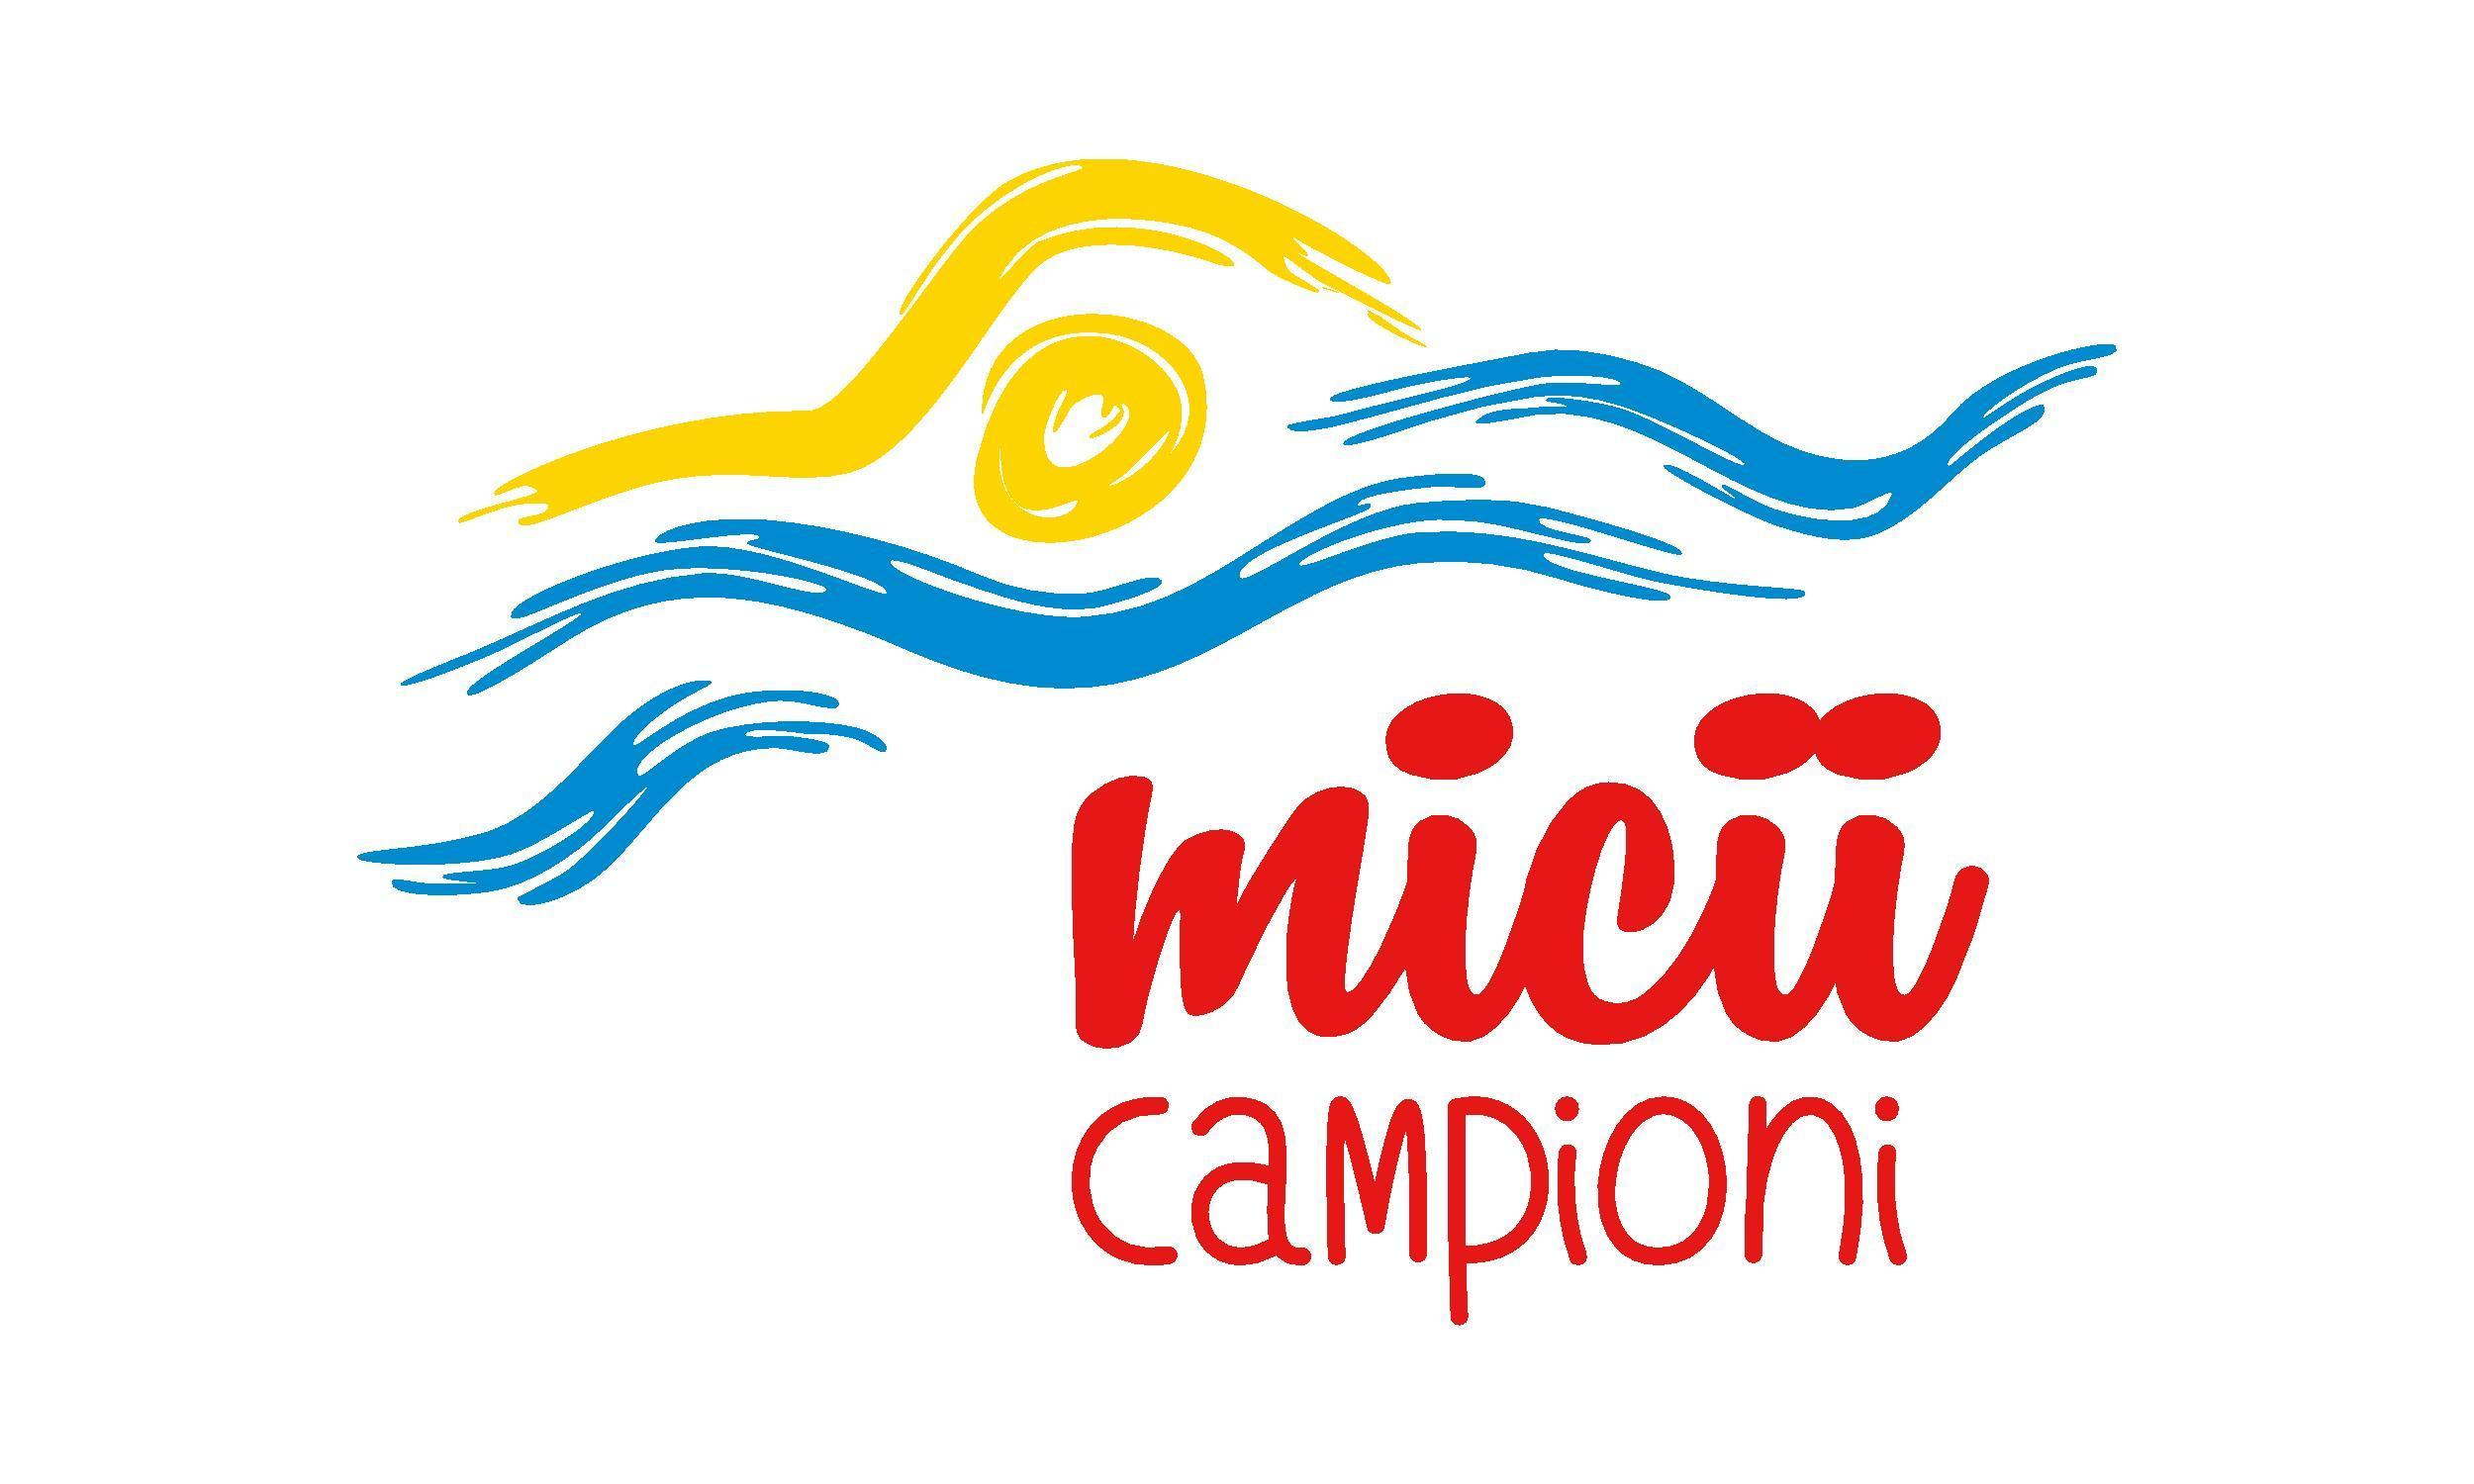 Micii Campioni